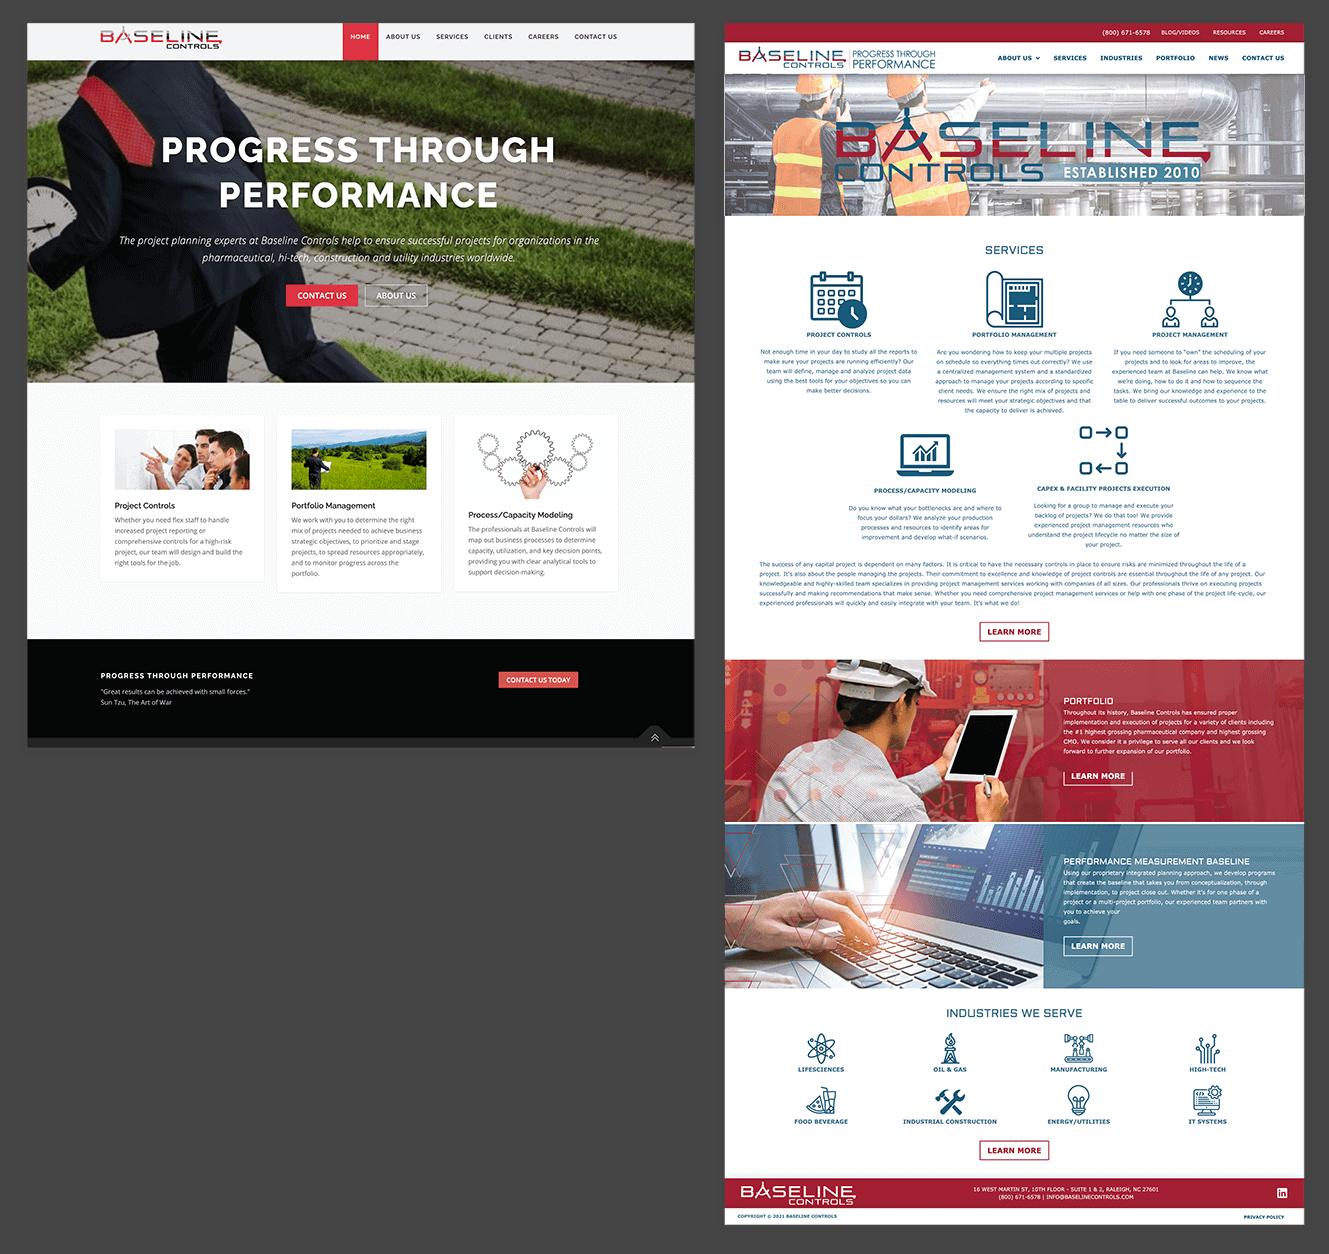 Baseline Controls Website